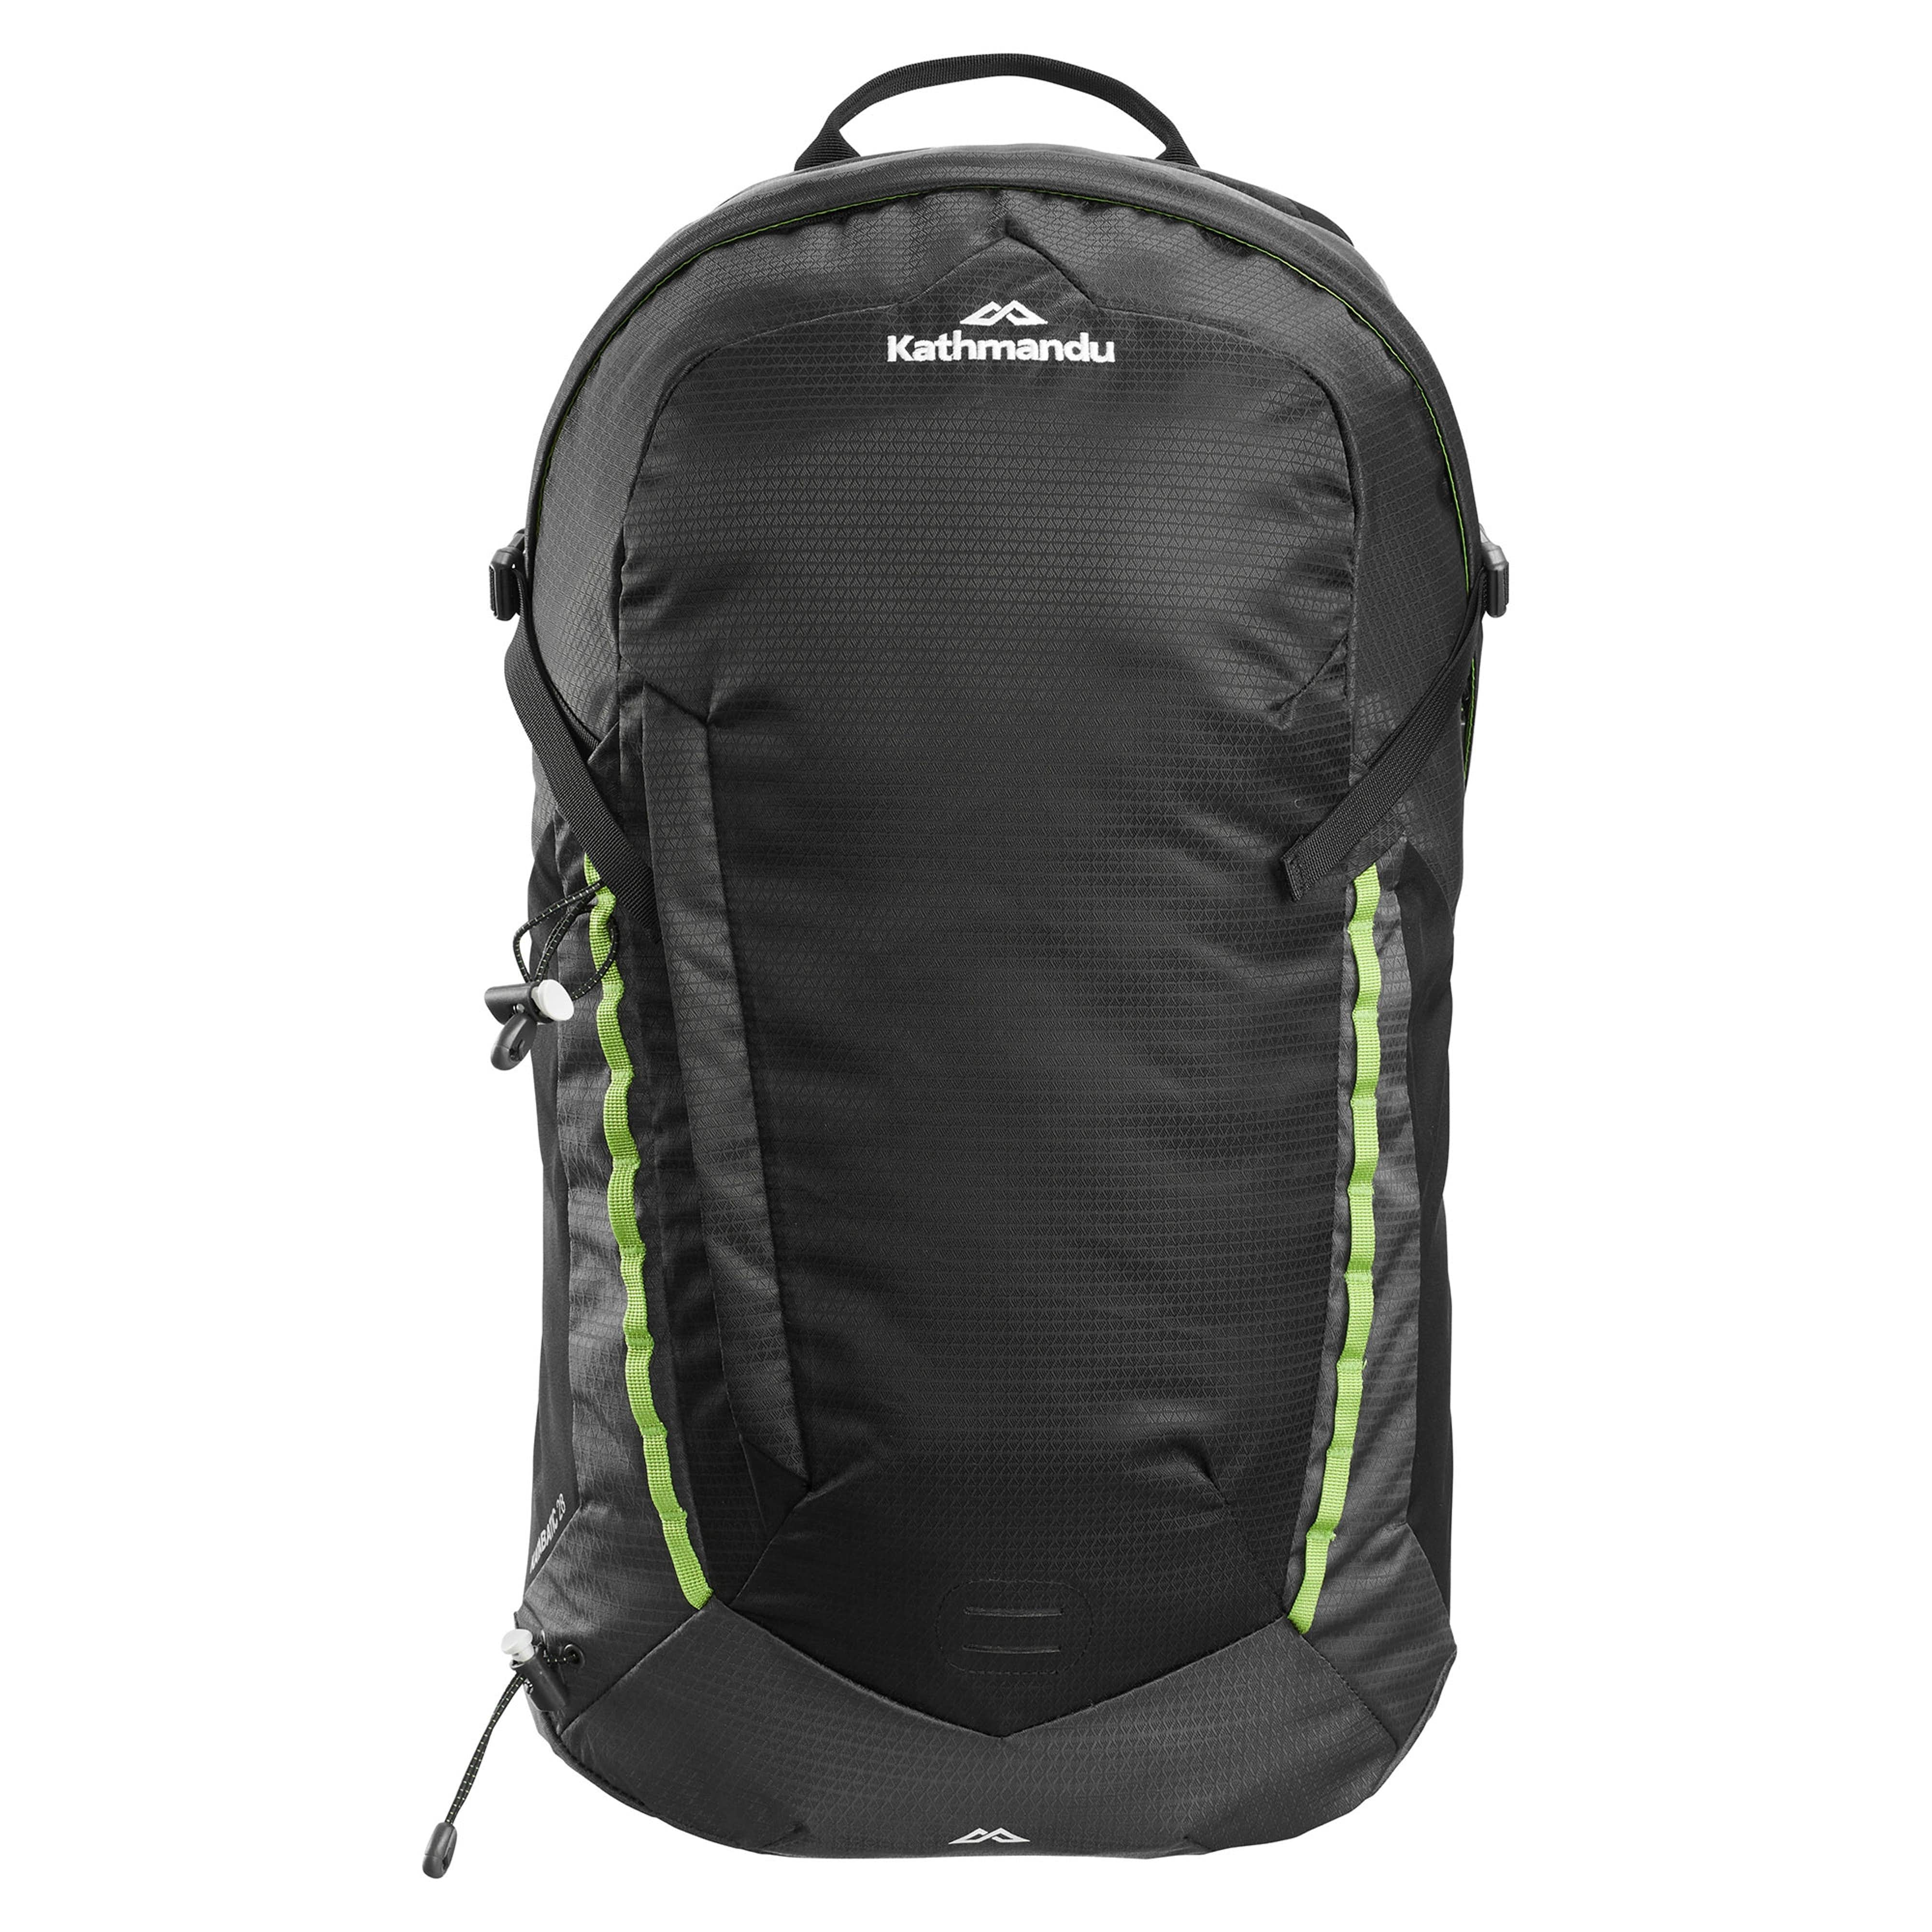 02b6800703 Hiking   Camping Bags